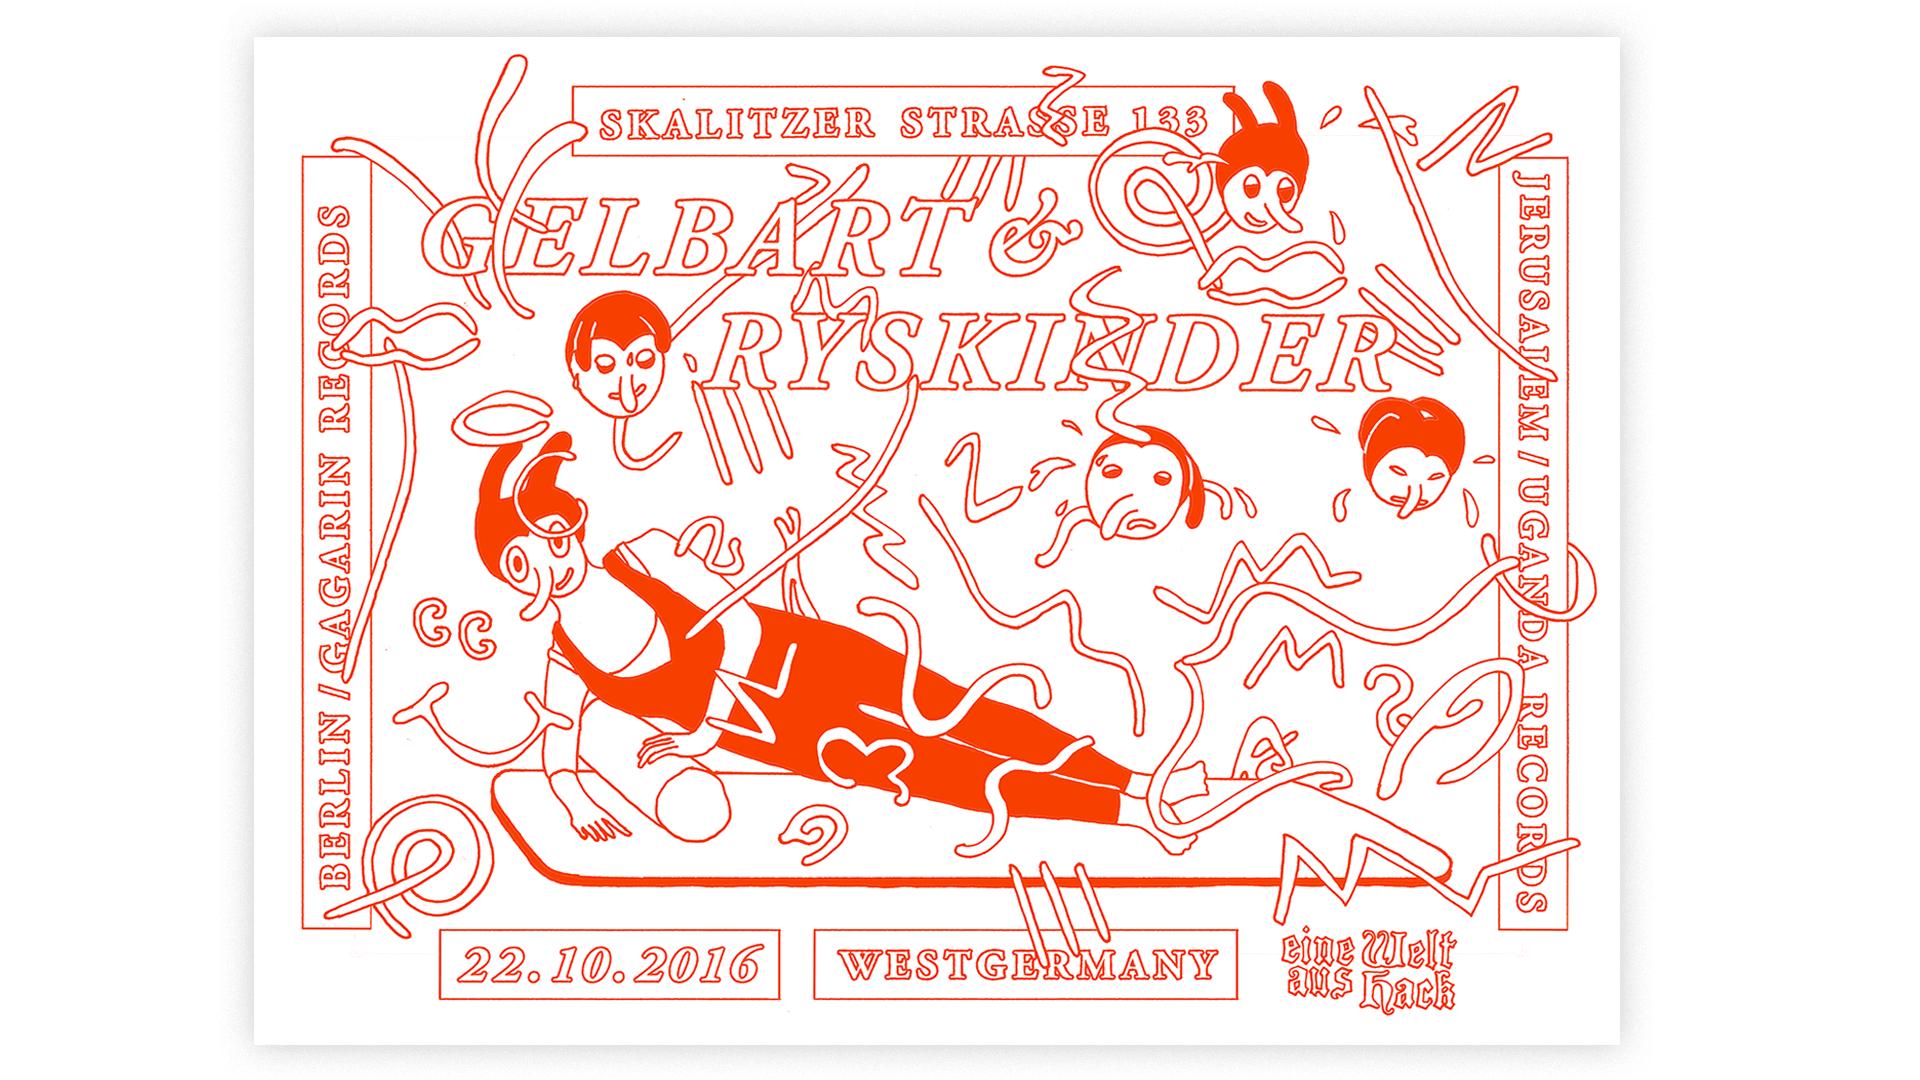 Studio Goof Julia Boehme Poster Design Berlin Show Poster Gelbart Ryskinder Plakat Illustration